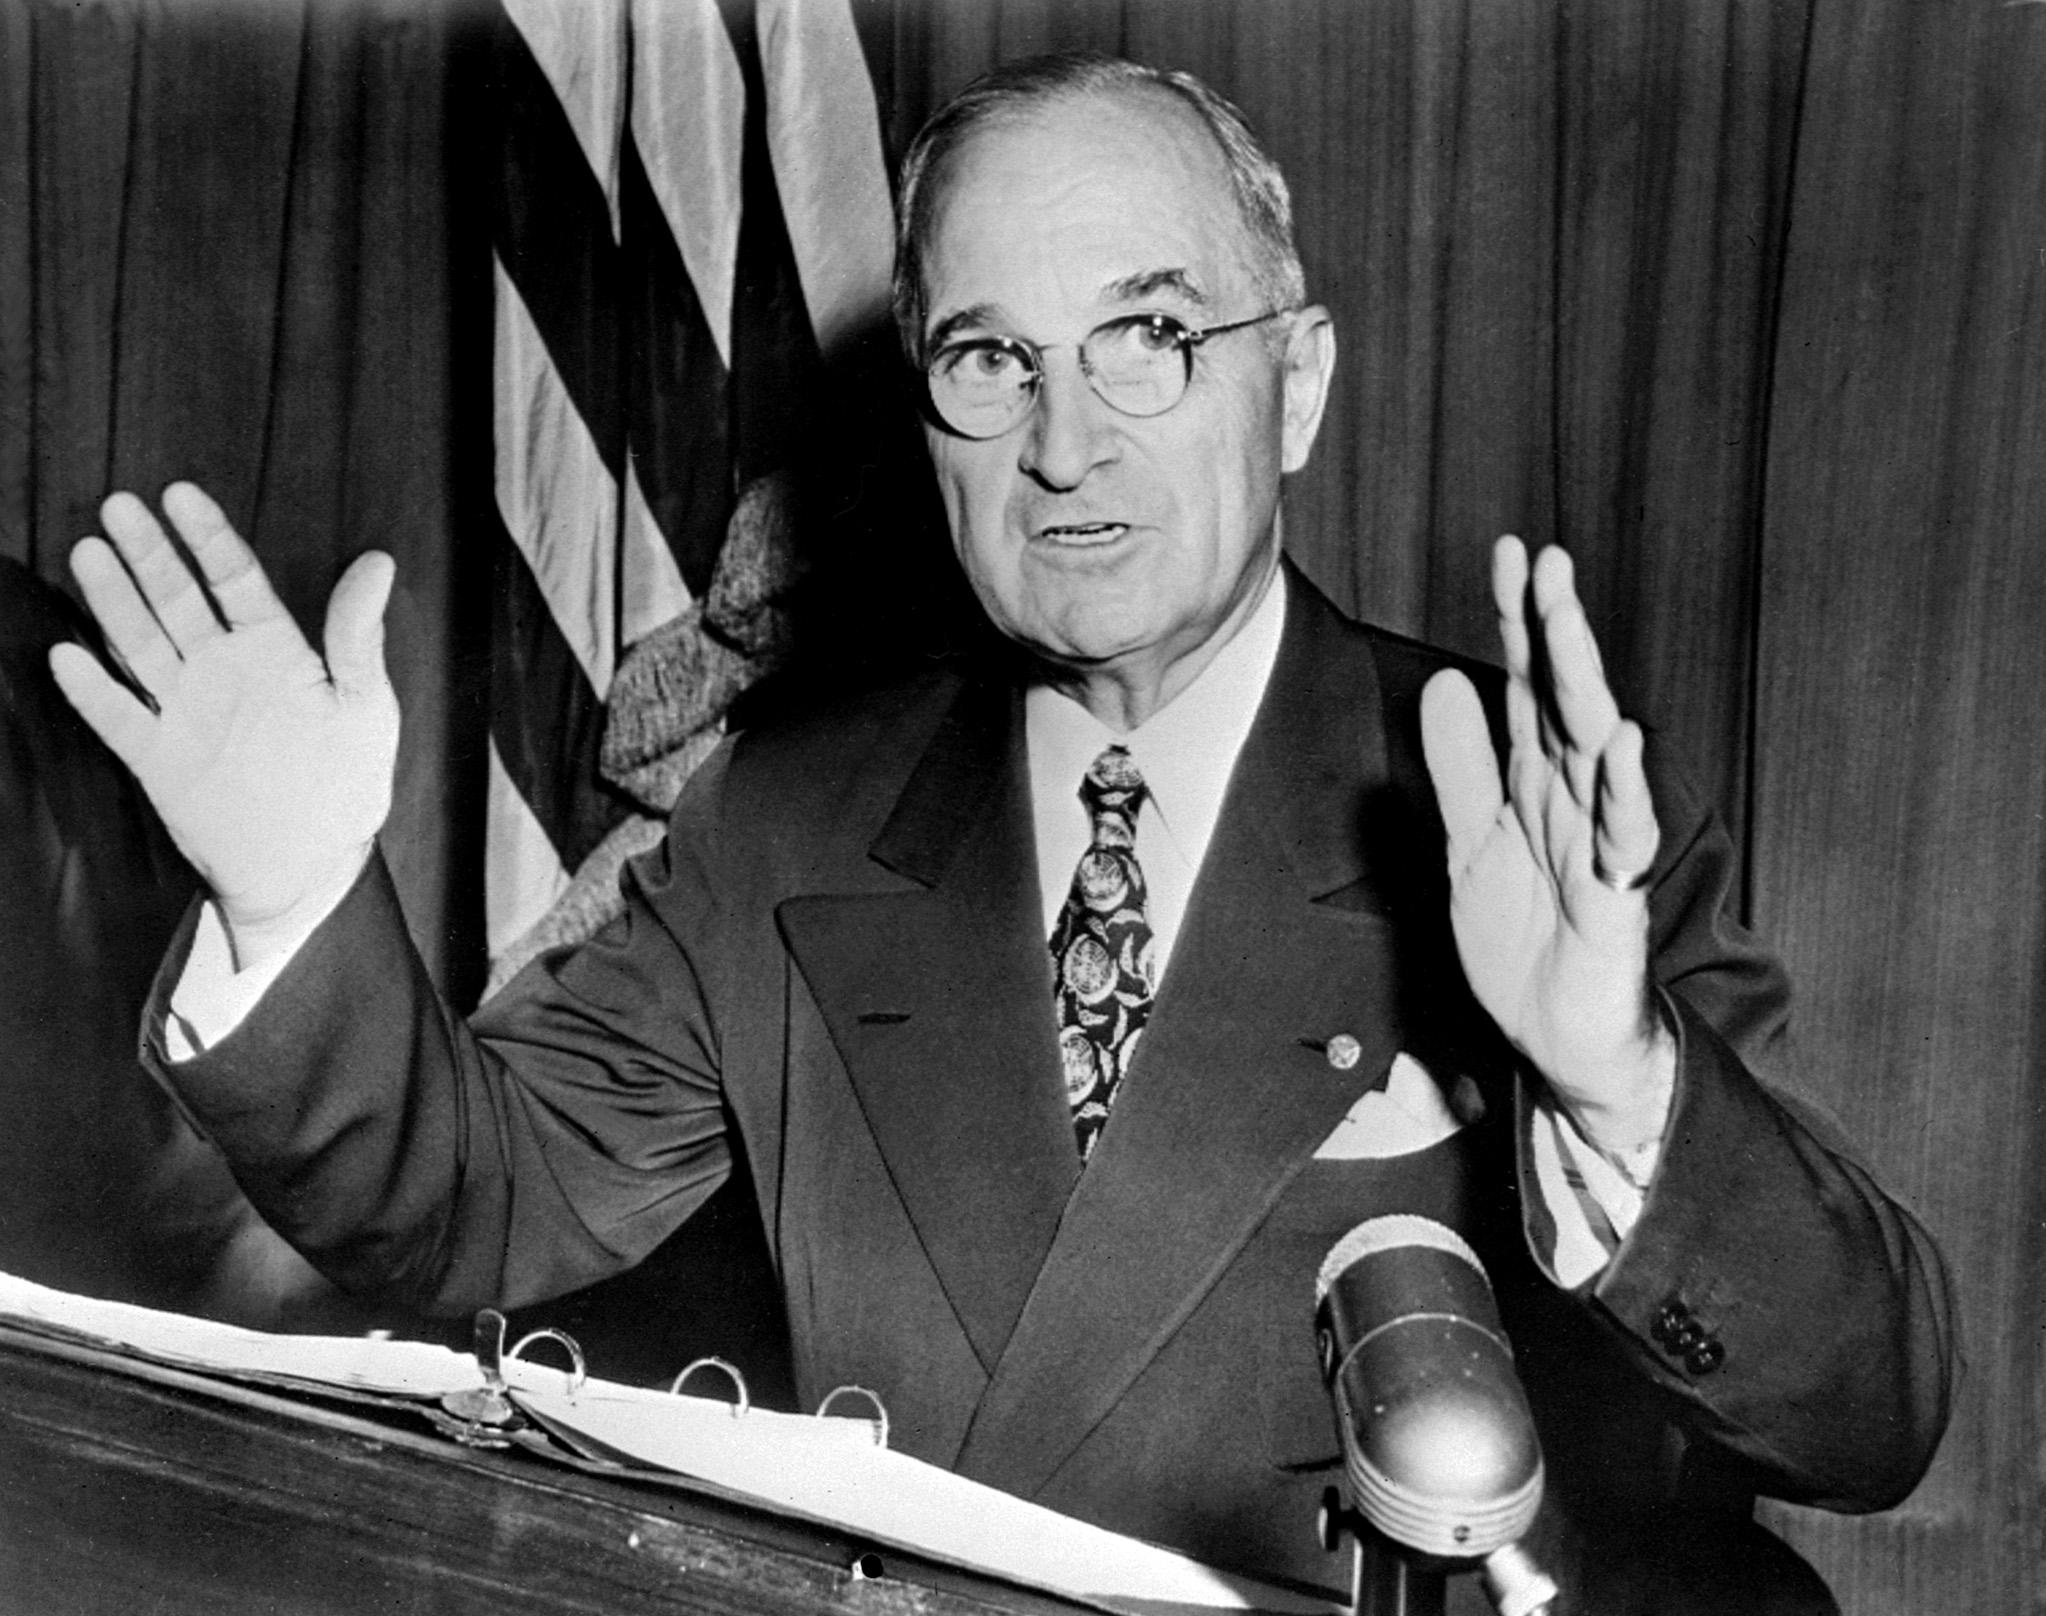 الرئيس السابق هاري تورمان